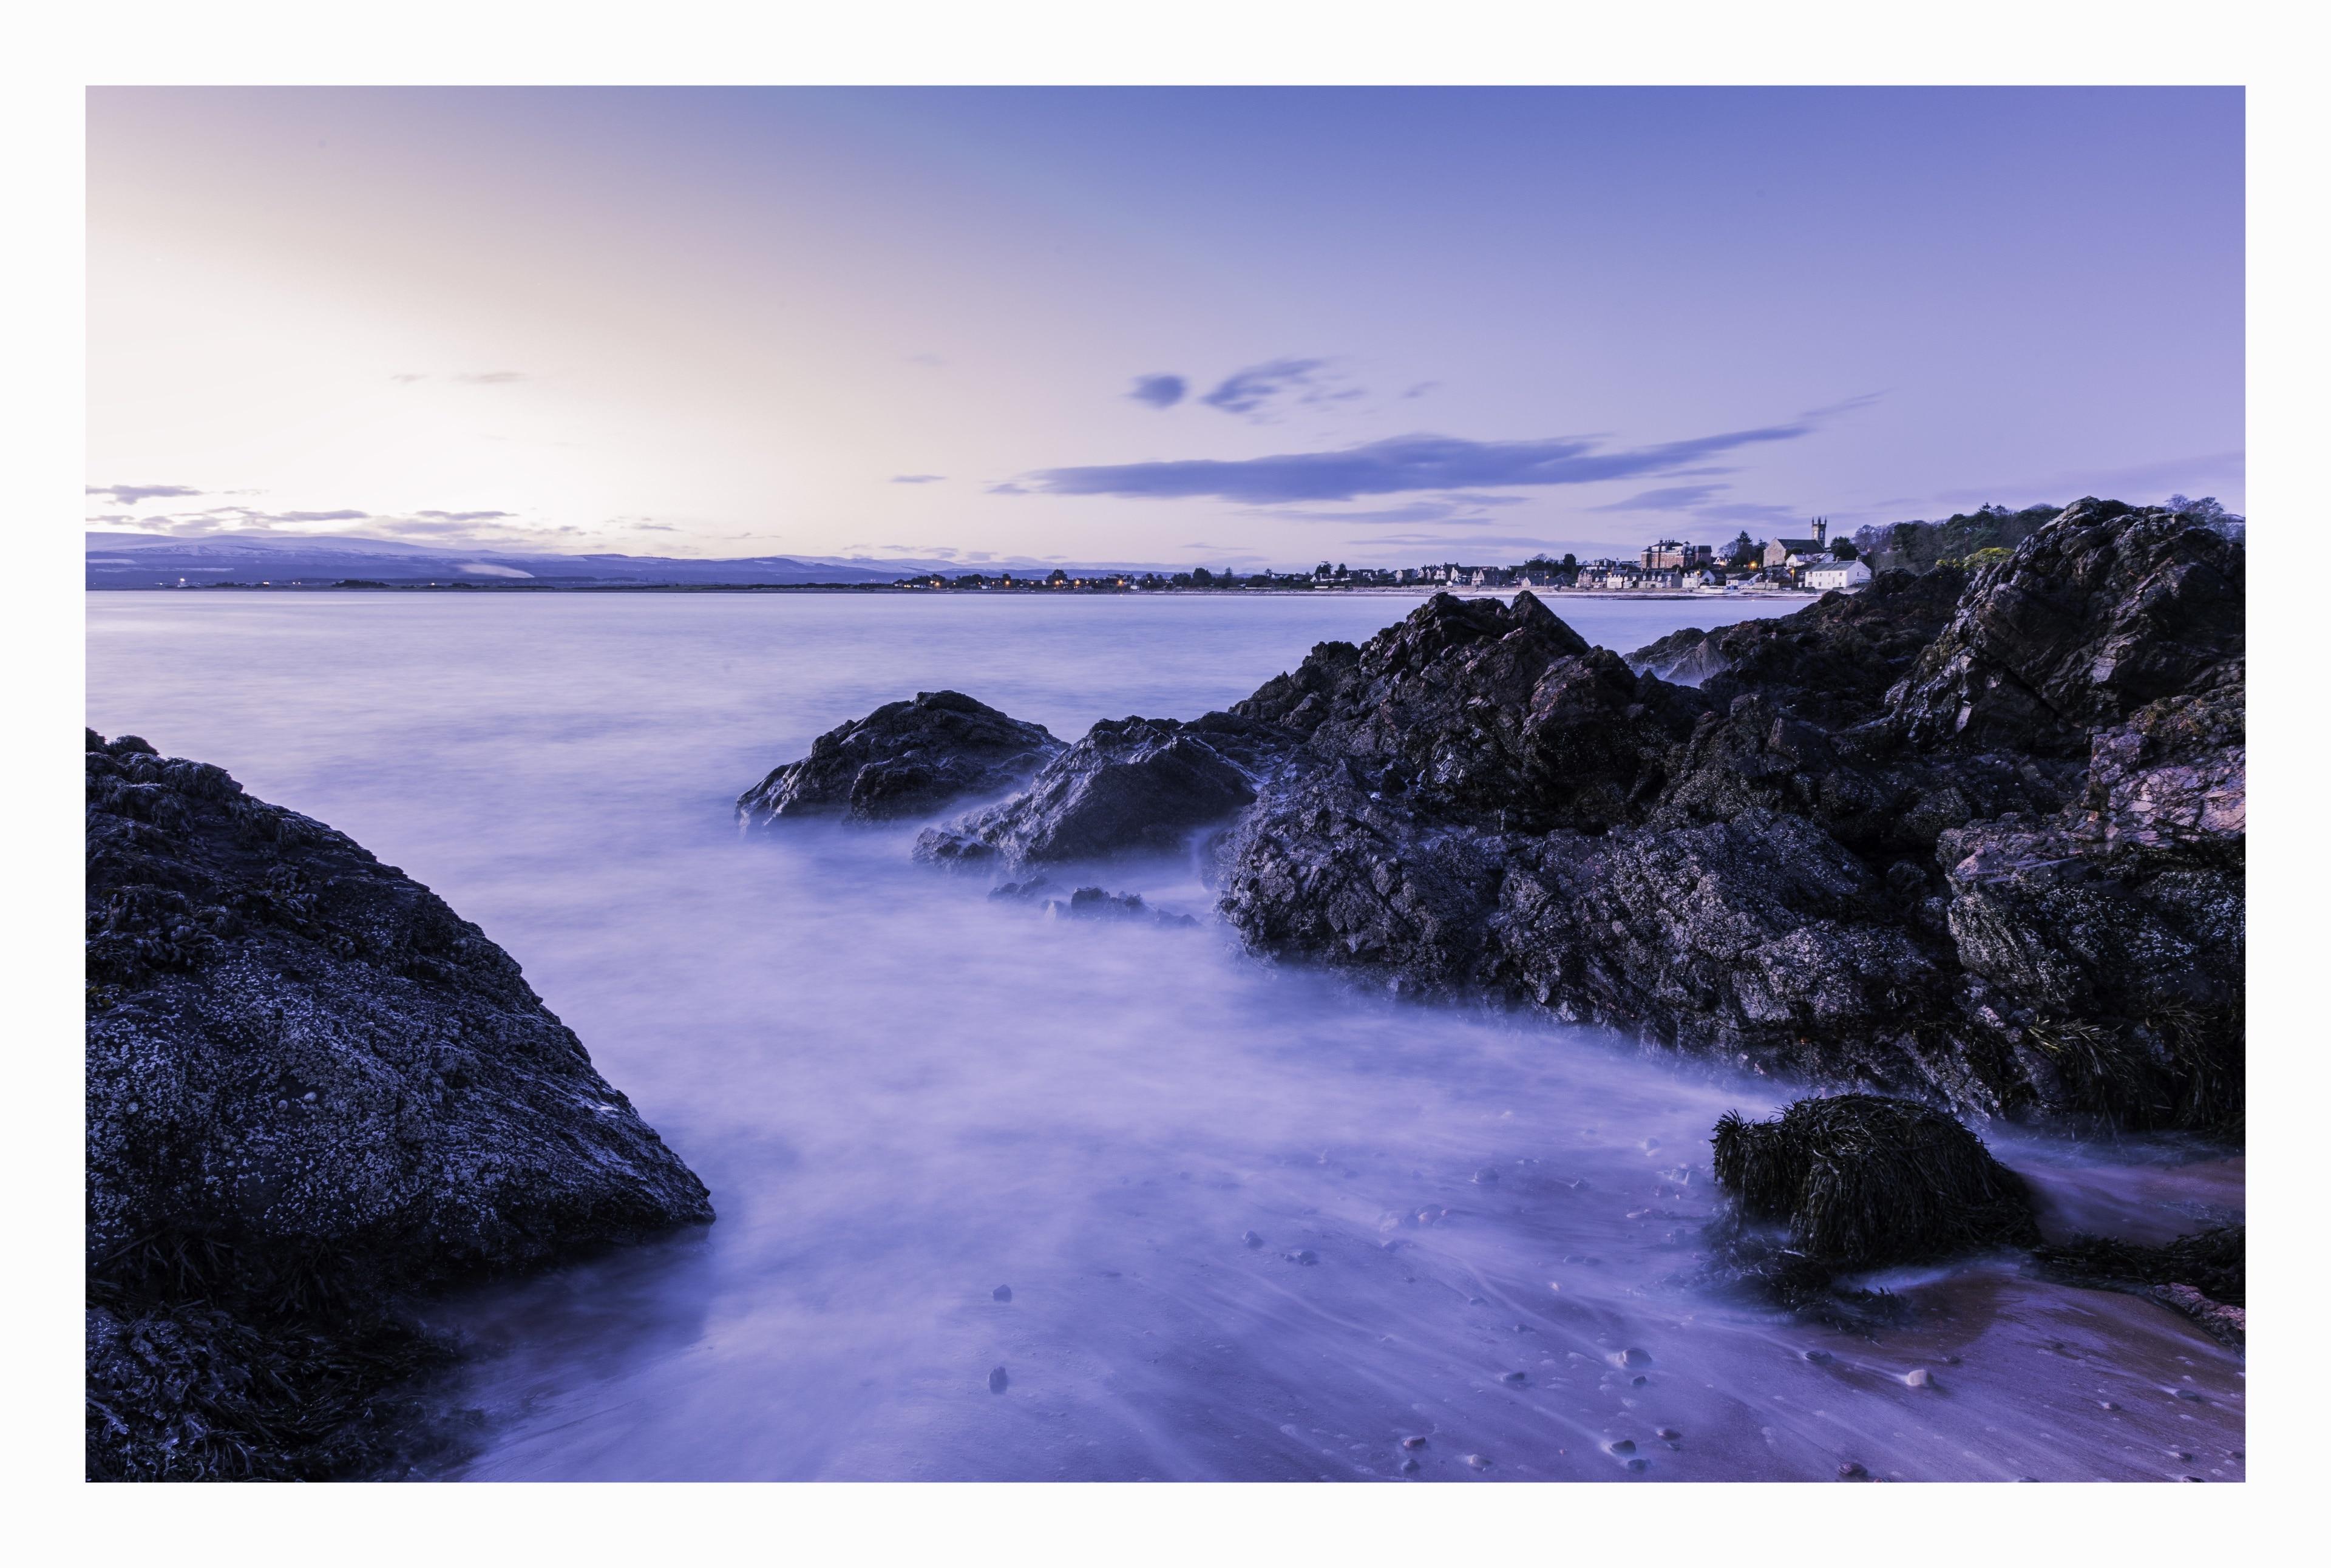 Rosemarkie, Fortrose, Scotland, United Kingdom